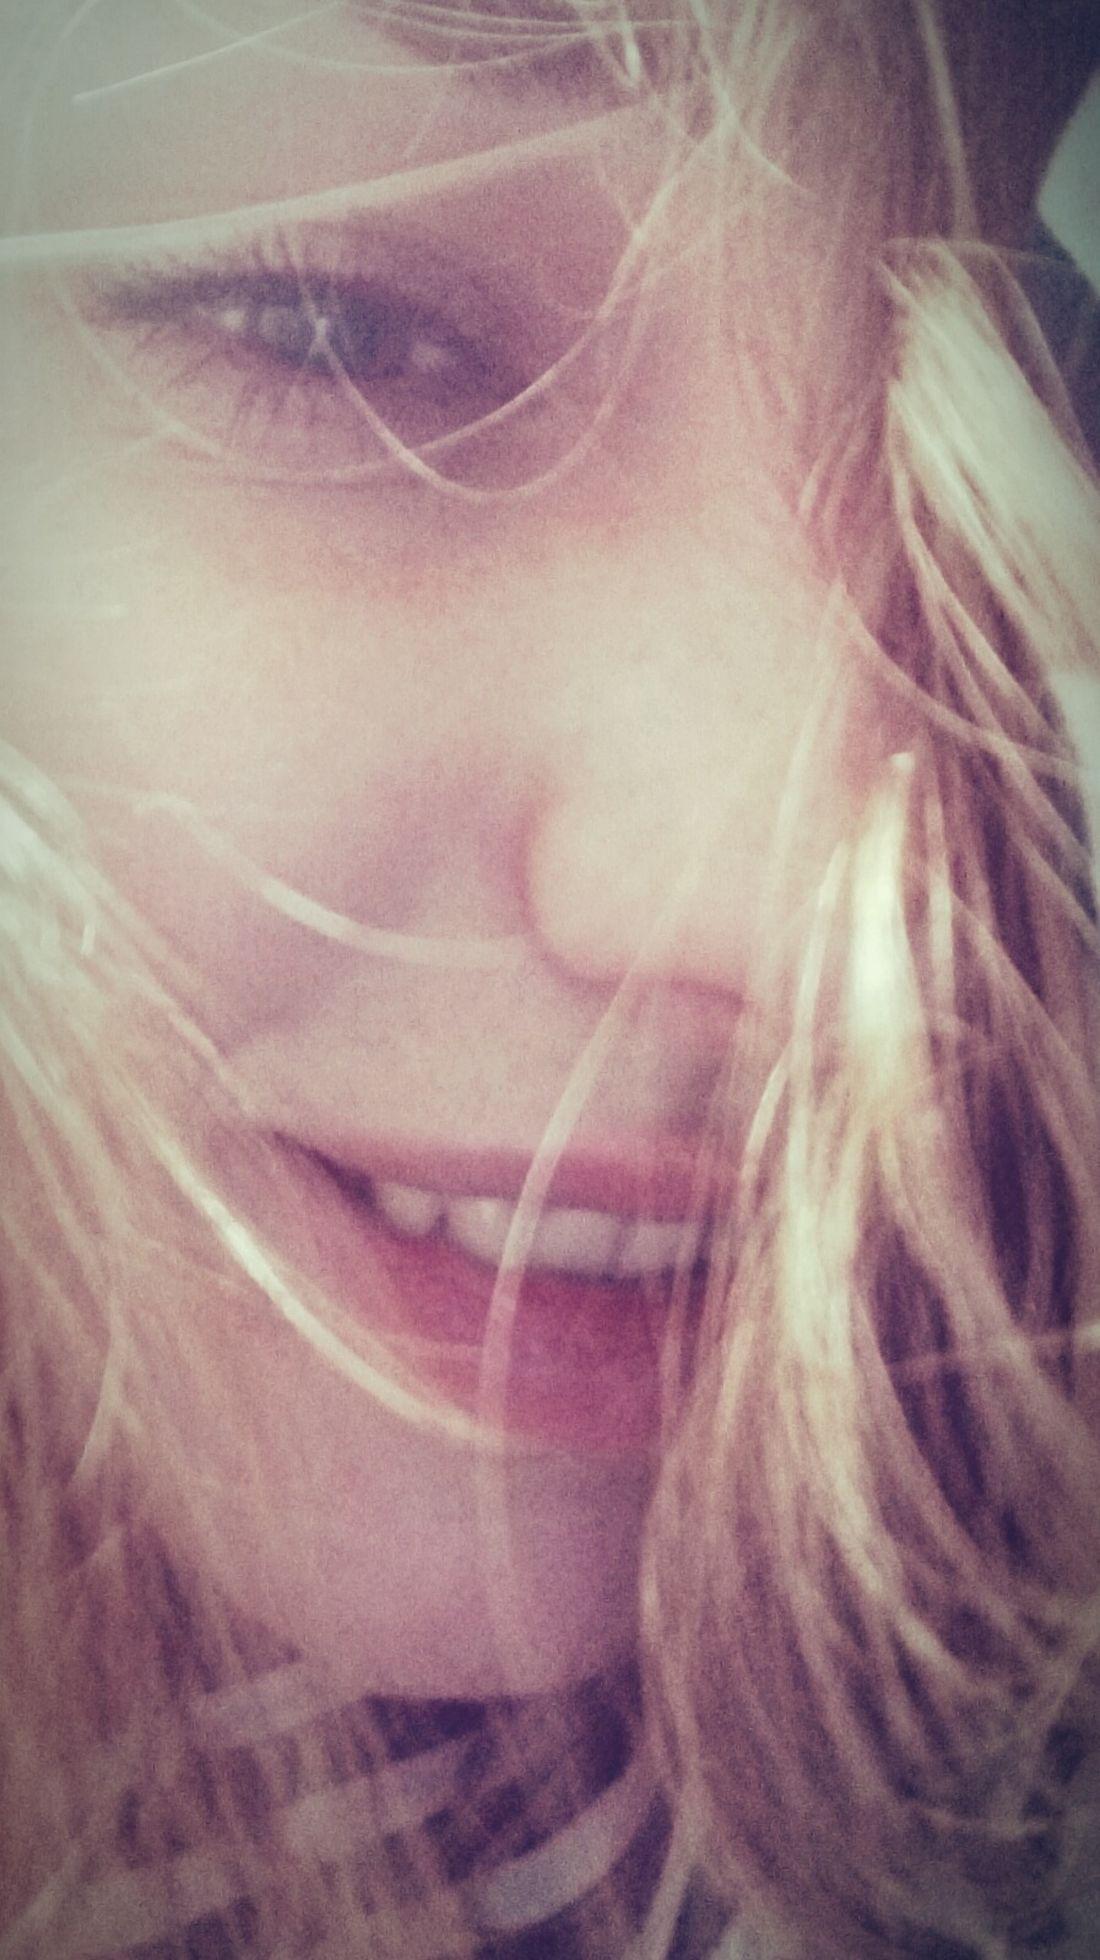 Showcase: February Self Portrait Selfie ✌ Selfportrait Enjoying Life Portrait Portrait Photography Sincerely  Sincerely Me Sensual Portrait That's Me! Portrait Of A Woman Portraits Visual Thought Hi! Smiling Happy Face Visual Thoughts PortraitPhotography Portraits Of EyeEm Autoportrait The Portraitist - The 2016 EyeEm Awards The Portraitist - 2016 EyeEm Awards